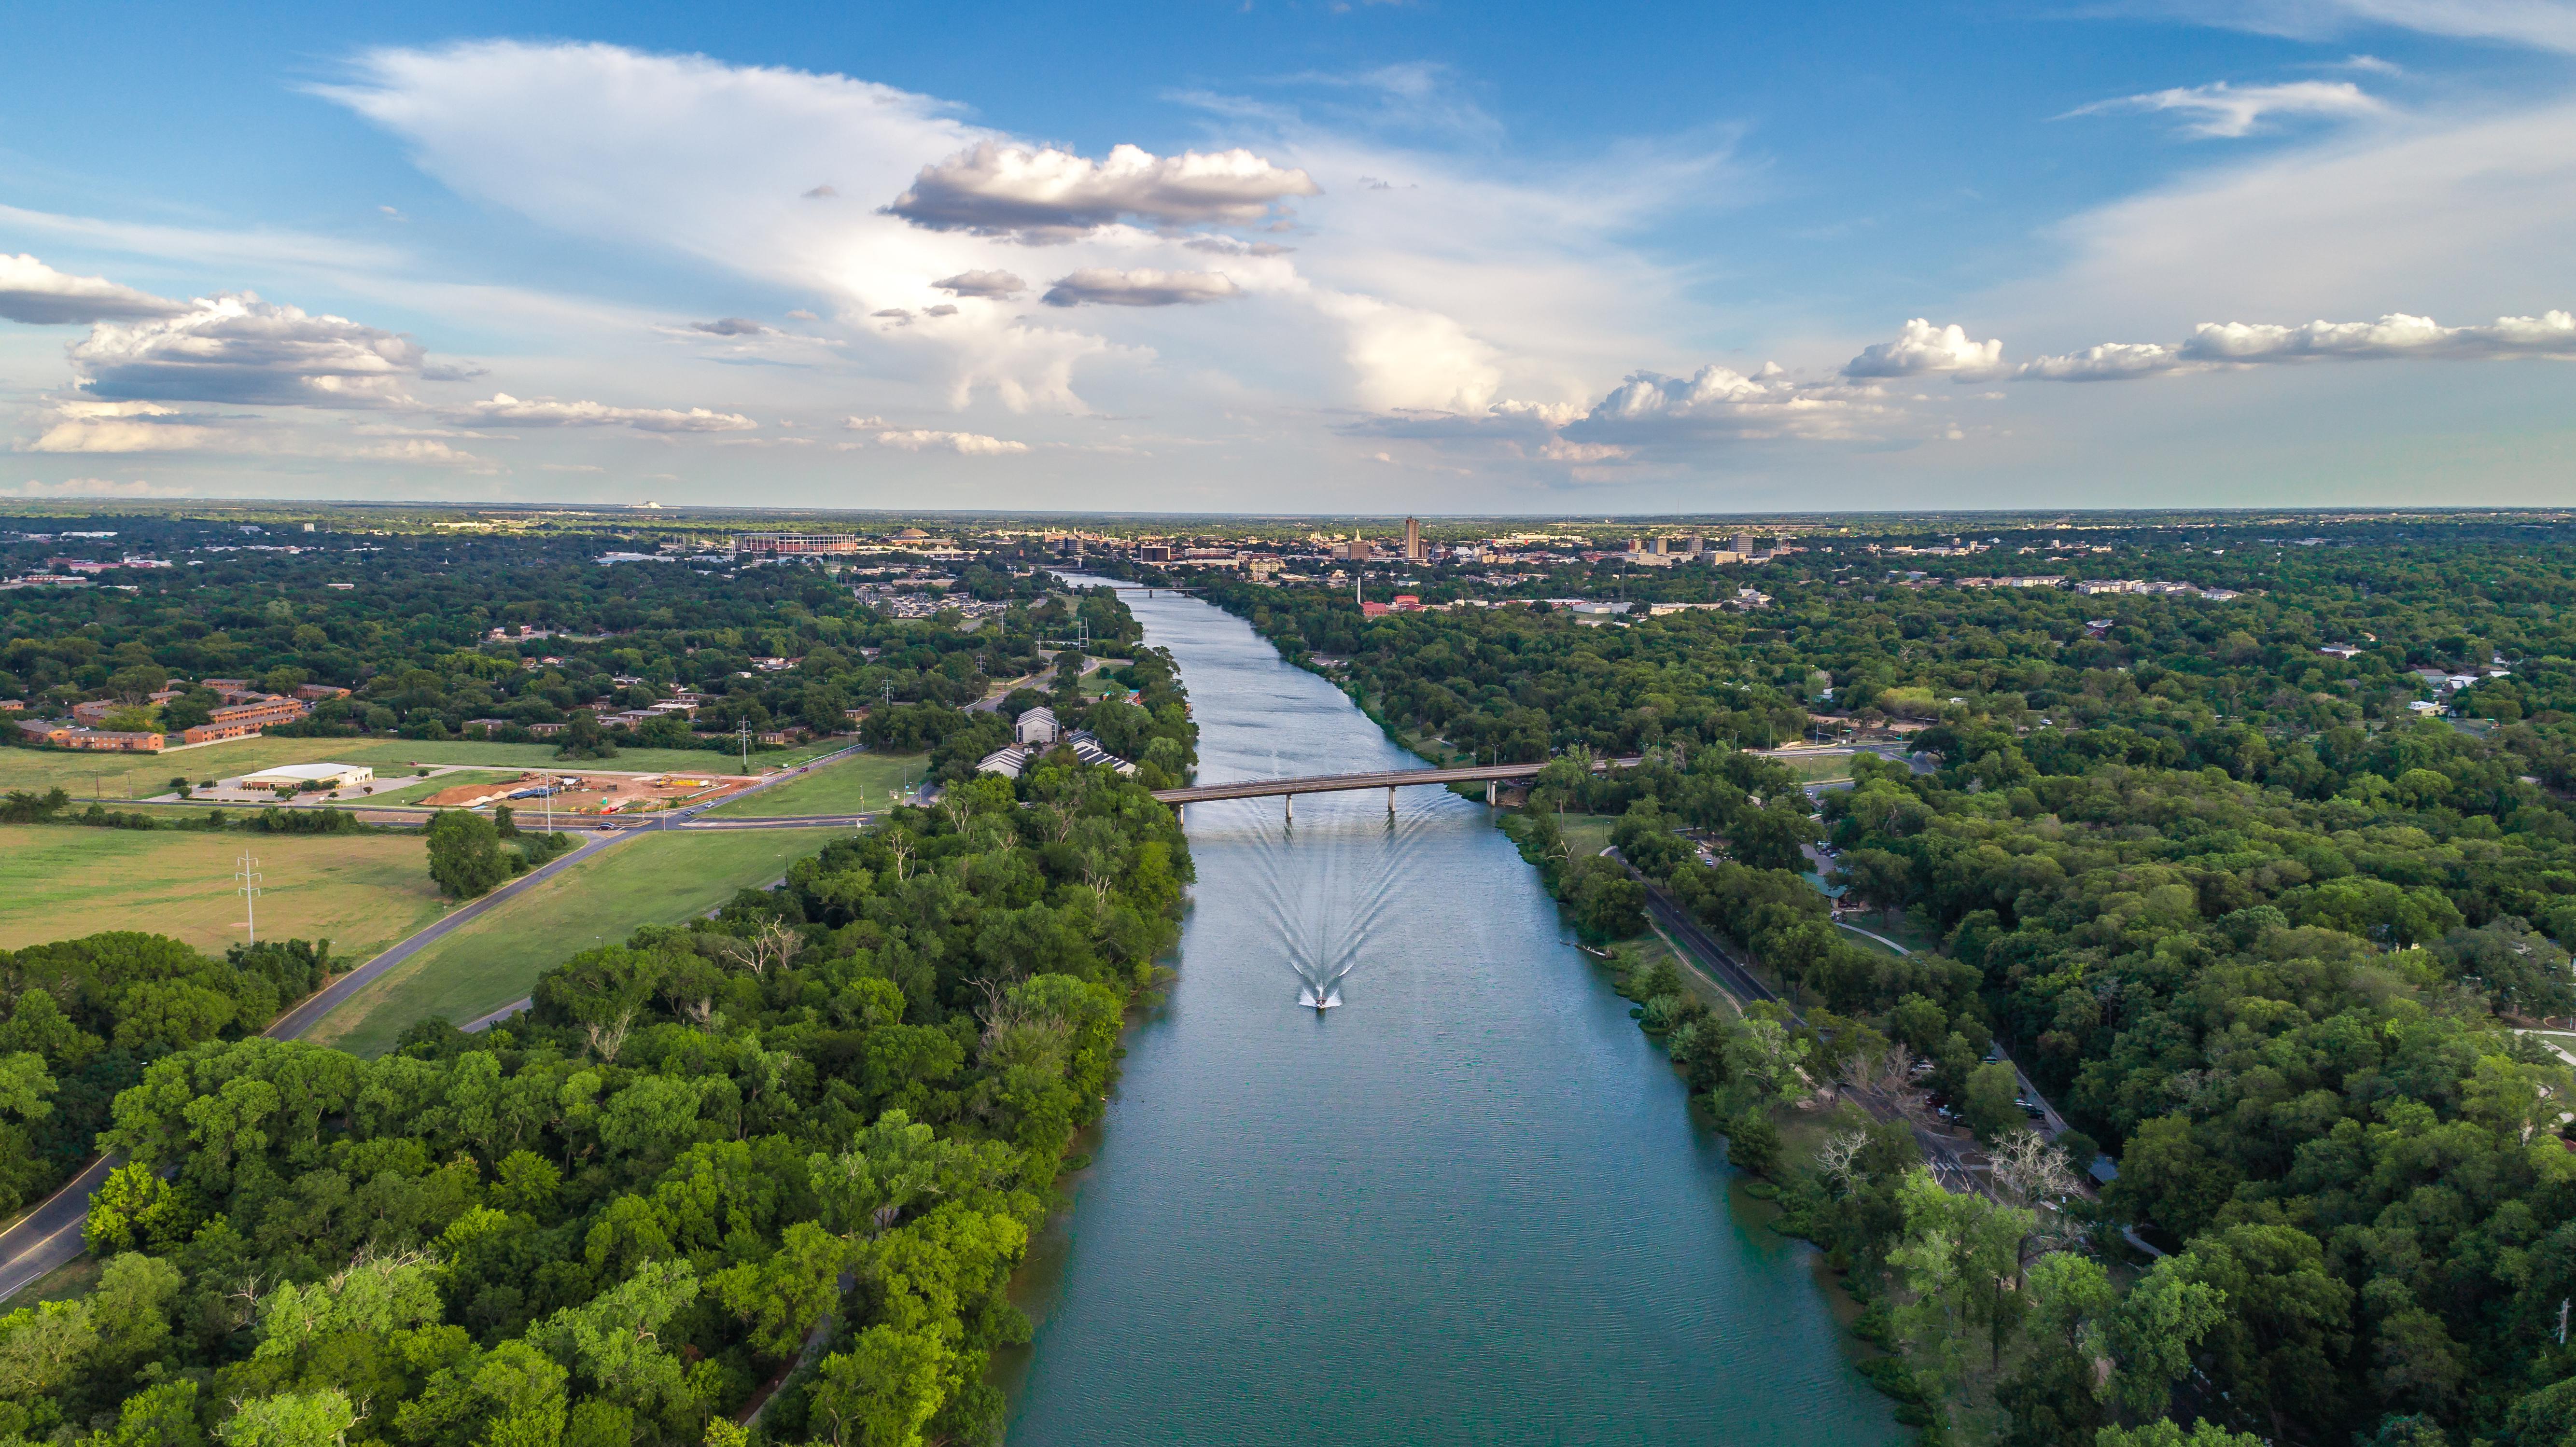 Brazos River in Waco